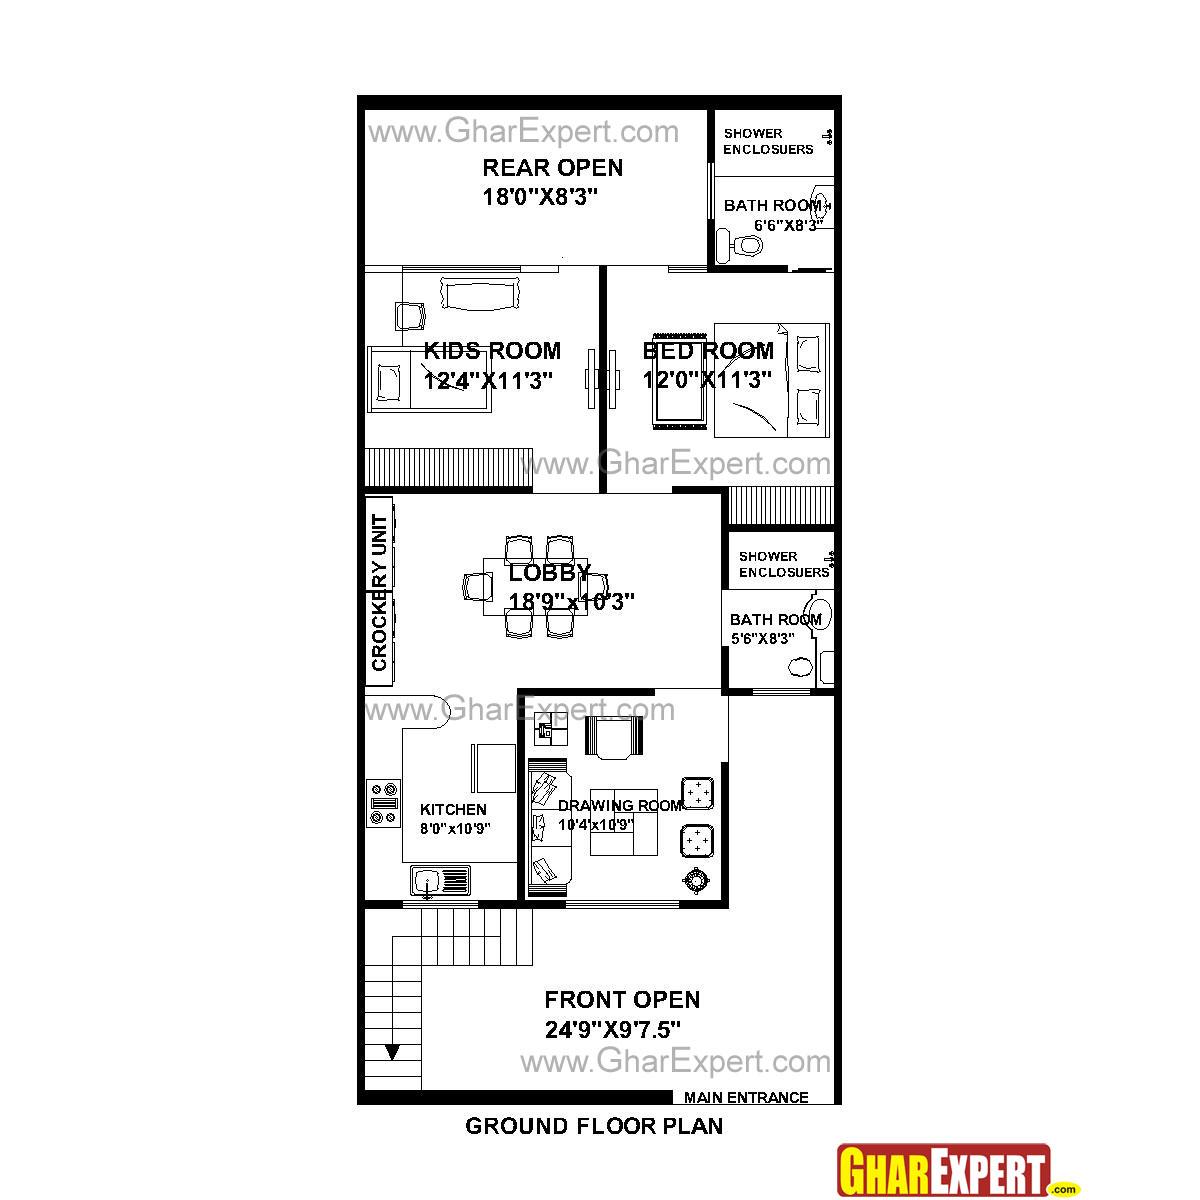 House Plan for 25 Feet by 53 Feet plot (Plot Size 147